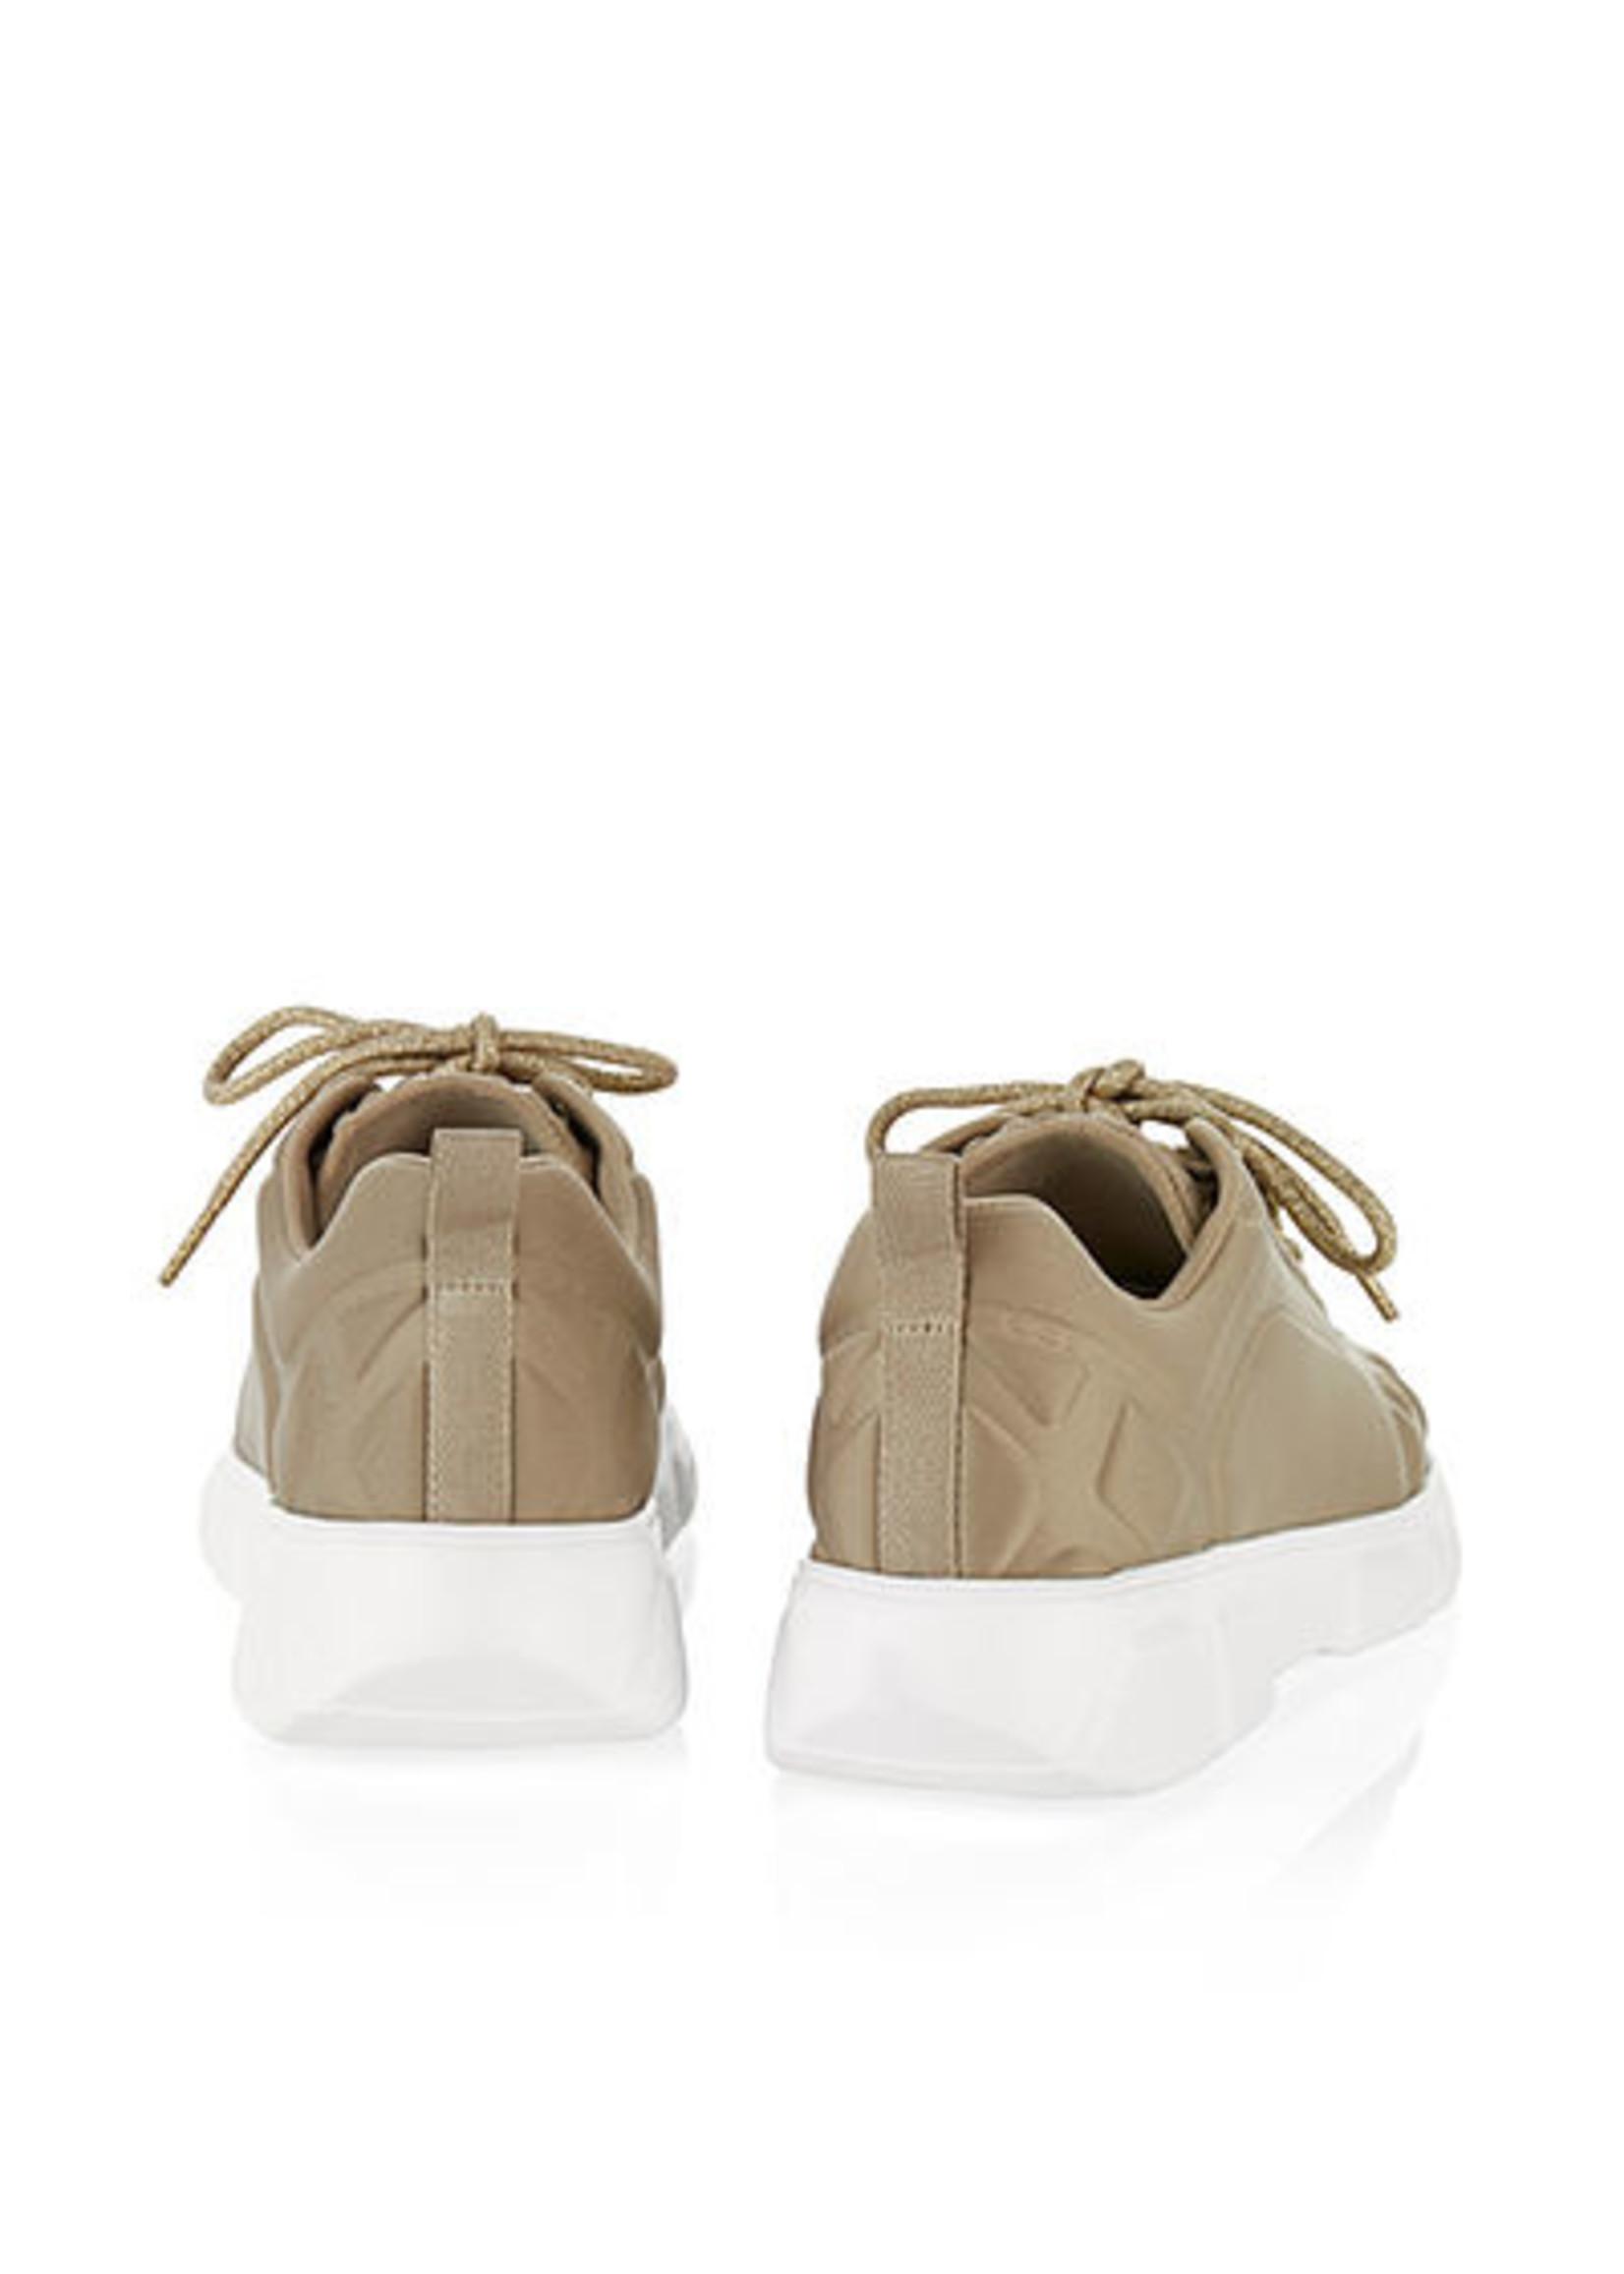 Marccain Bags & Shoes Sneaker RB SH.05 J03 latte macchiato